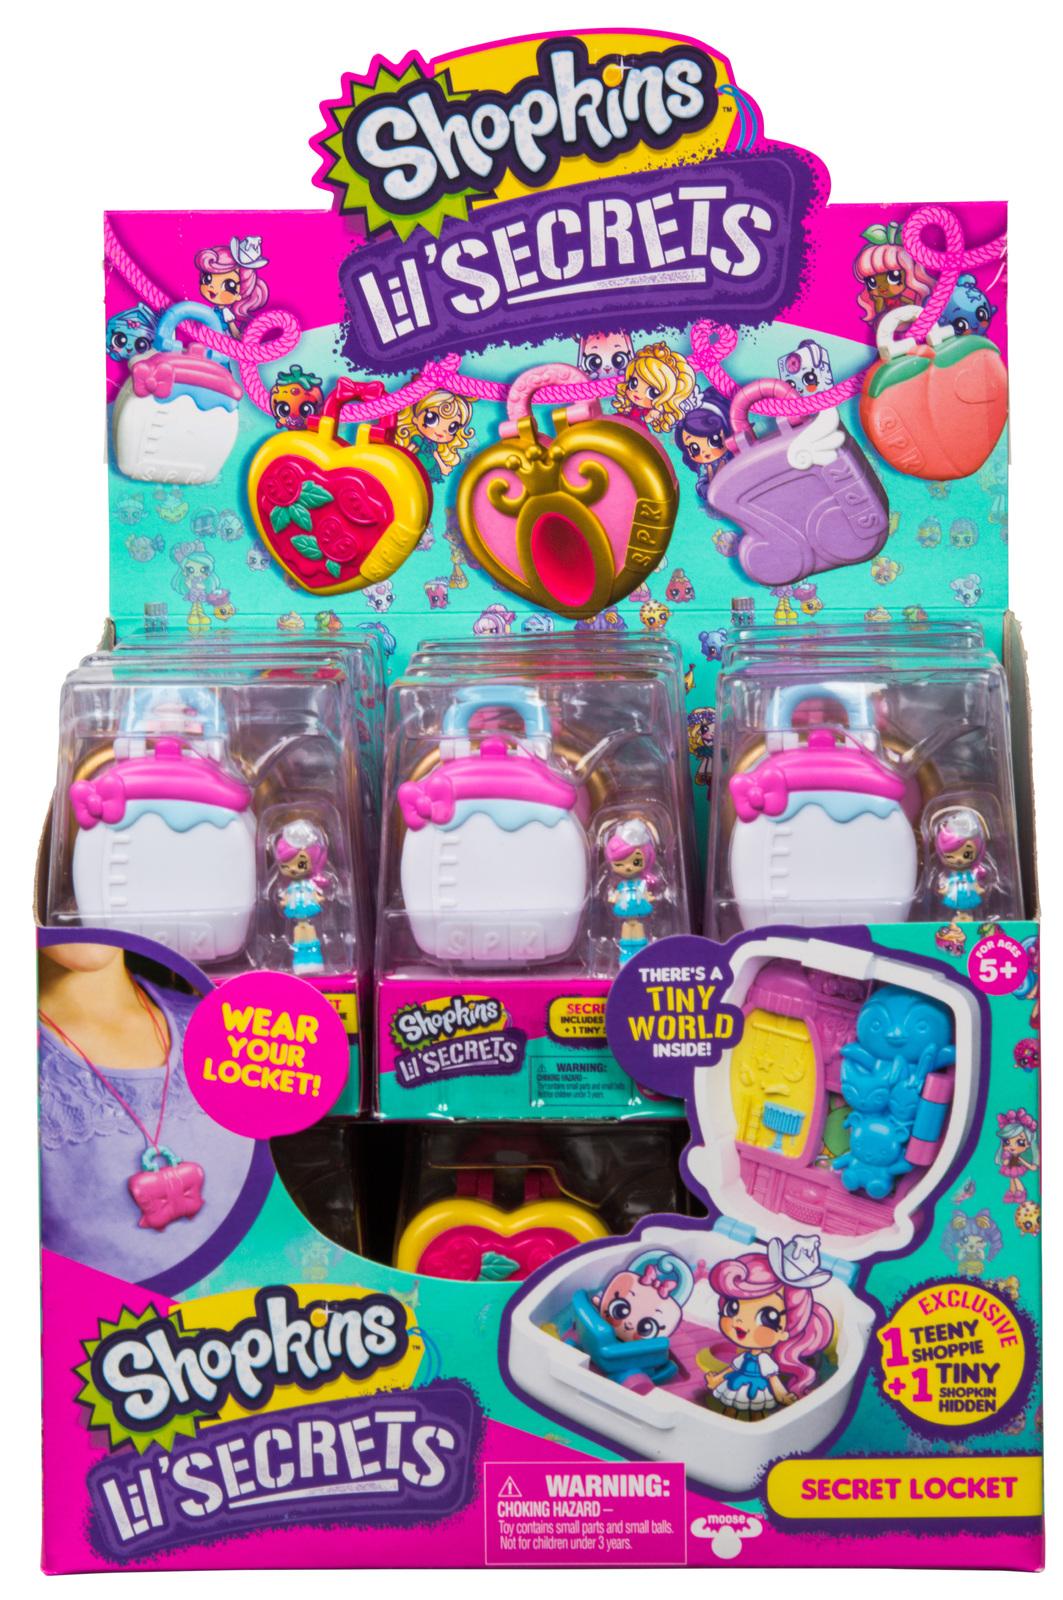 Shopkins: Little Secrets Playset - Tiny Tunes image